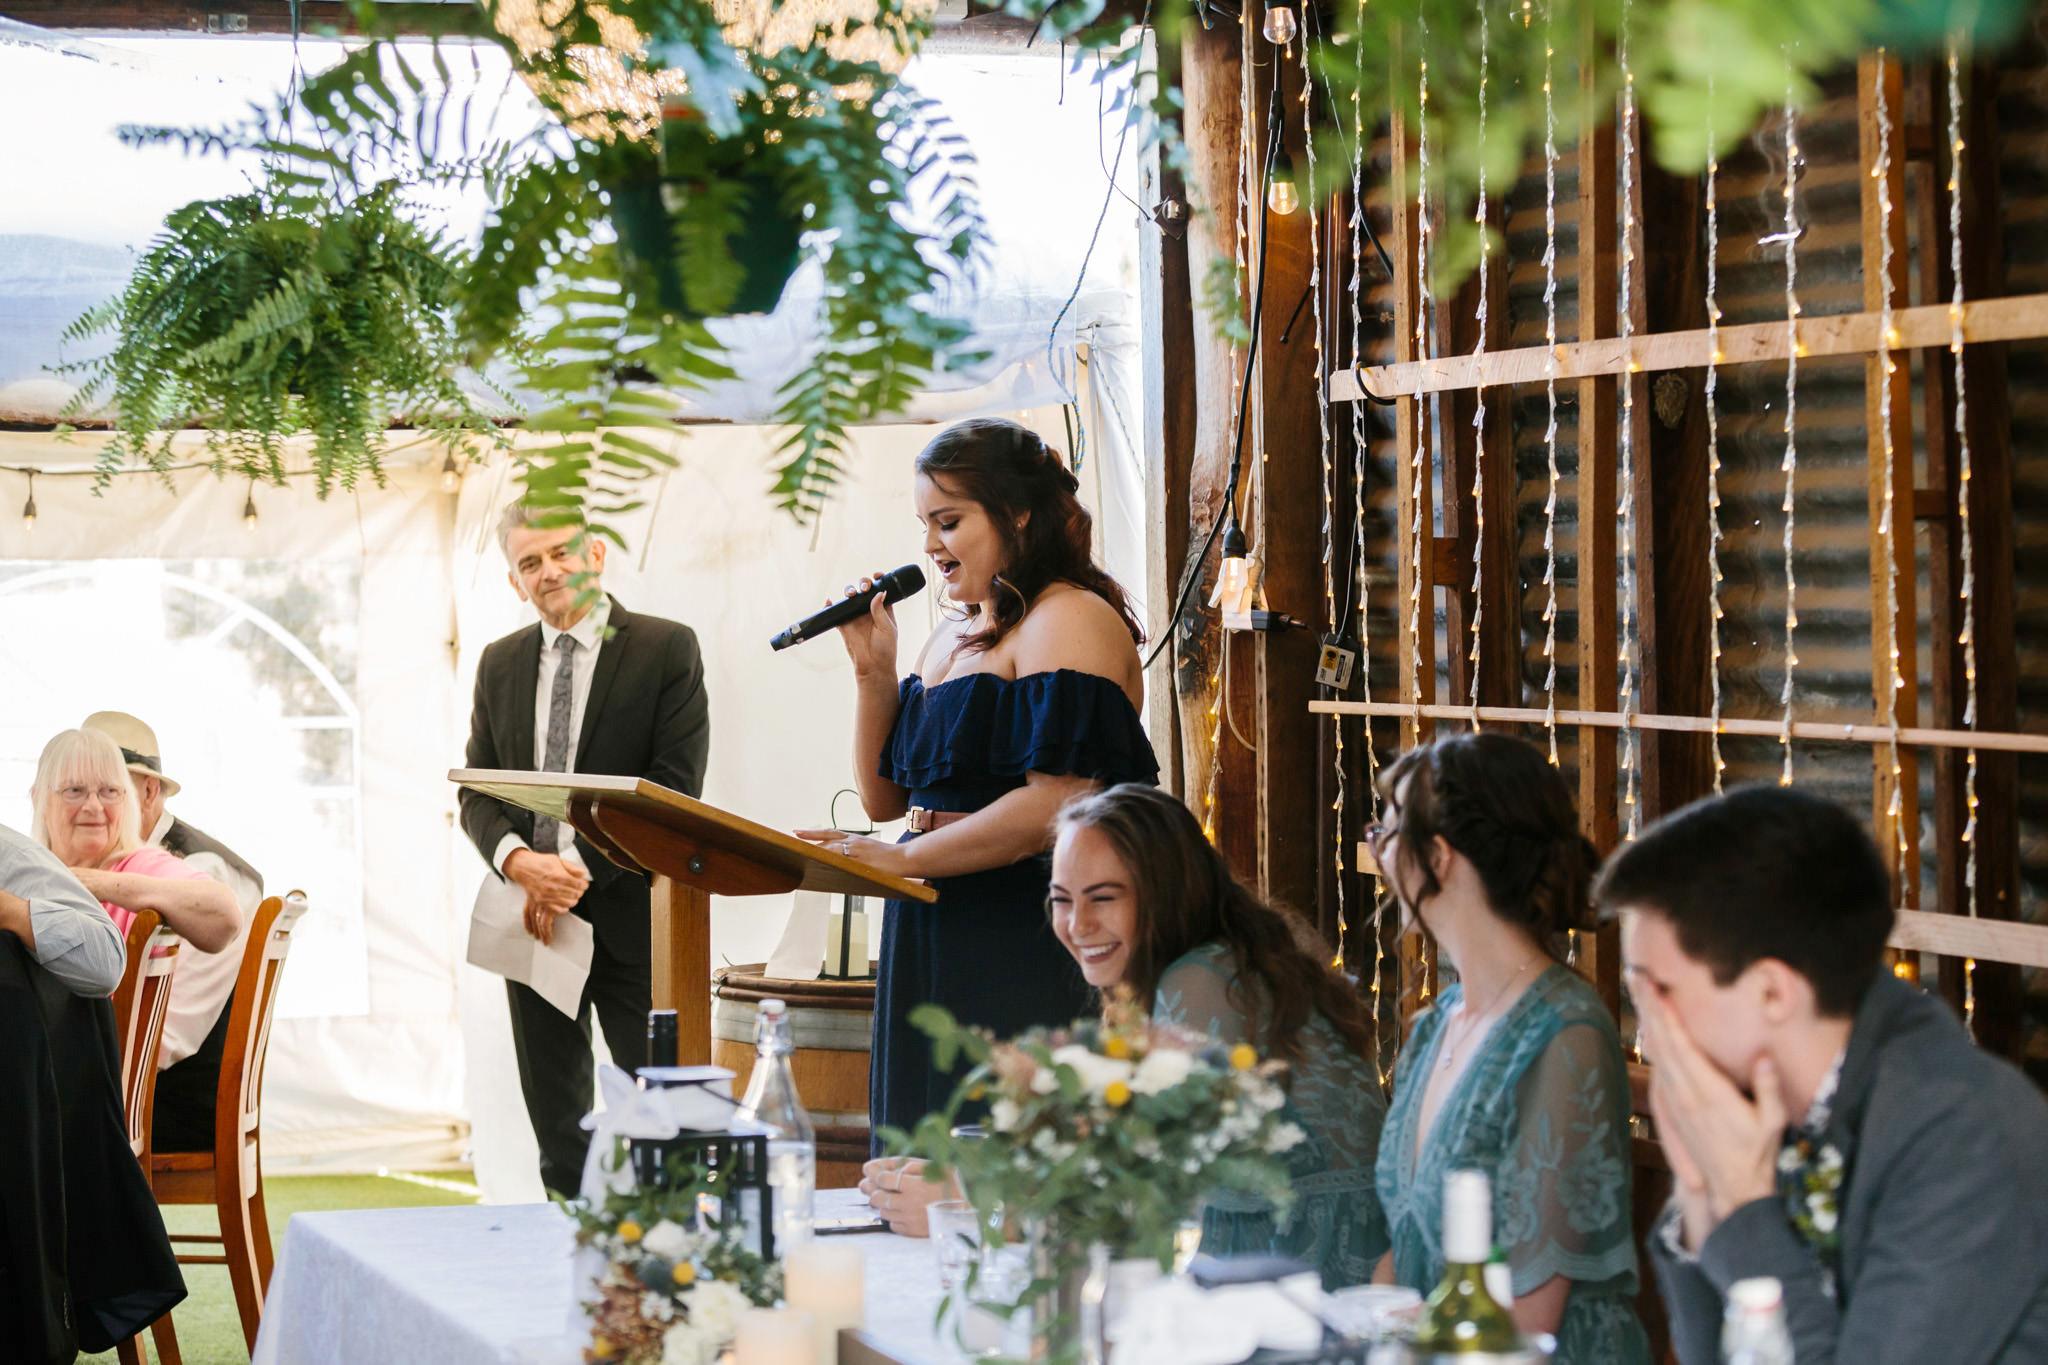 Erin_Latimore_Mudgee_Canberra_Wedding_Photographer_Tuggeranong_Homestead_466.JPG